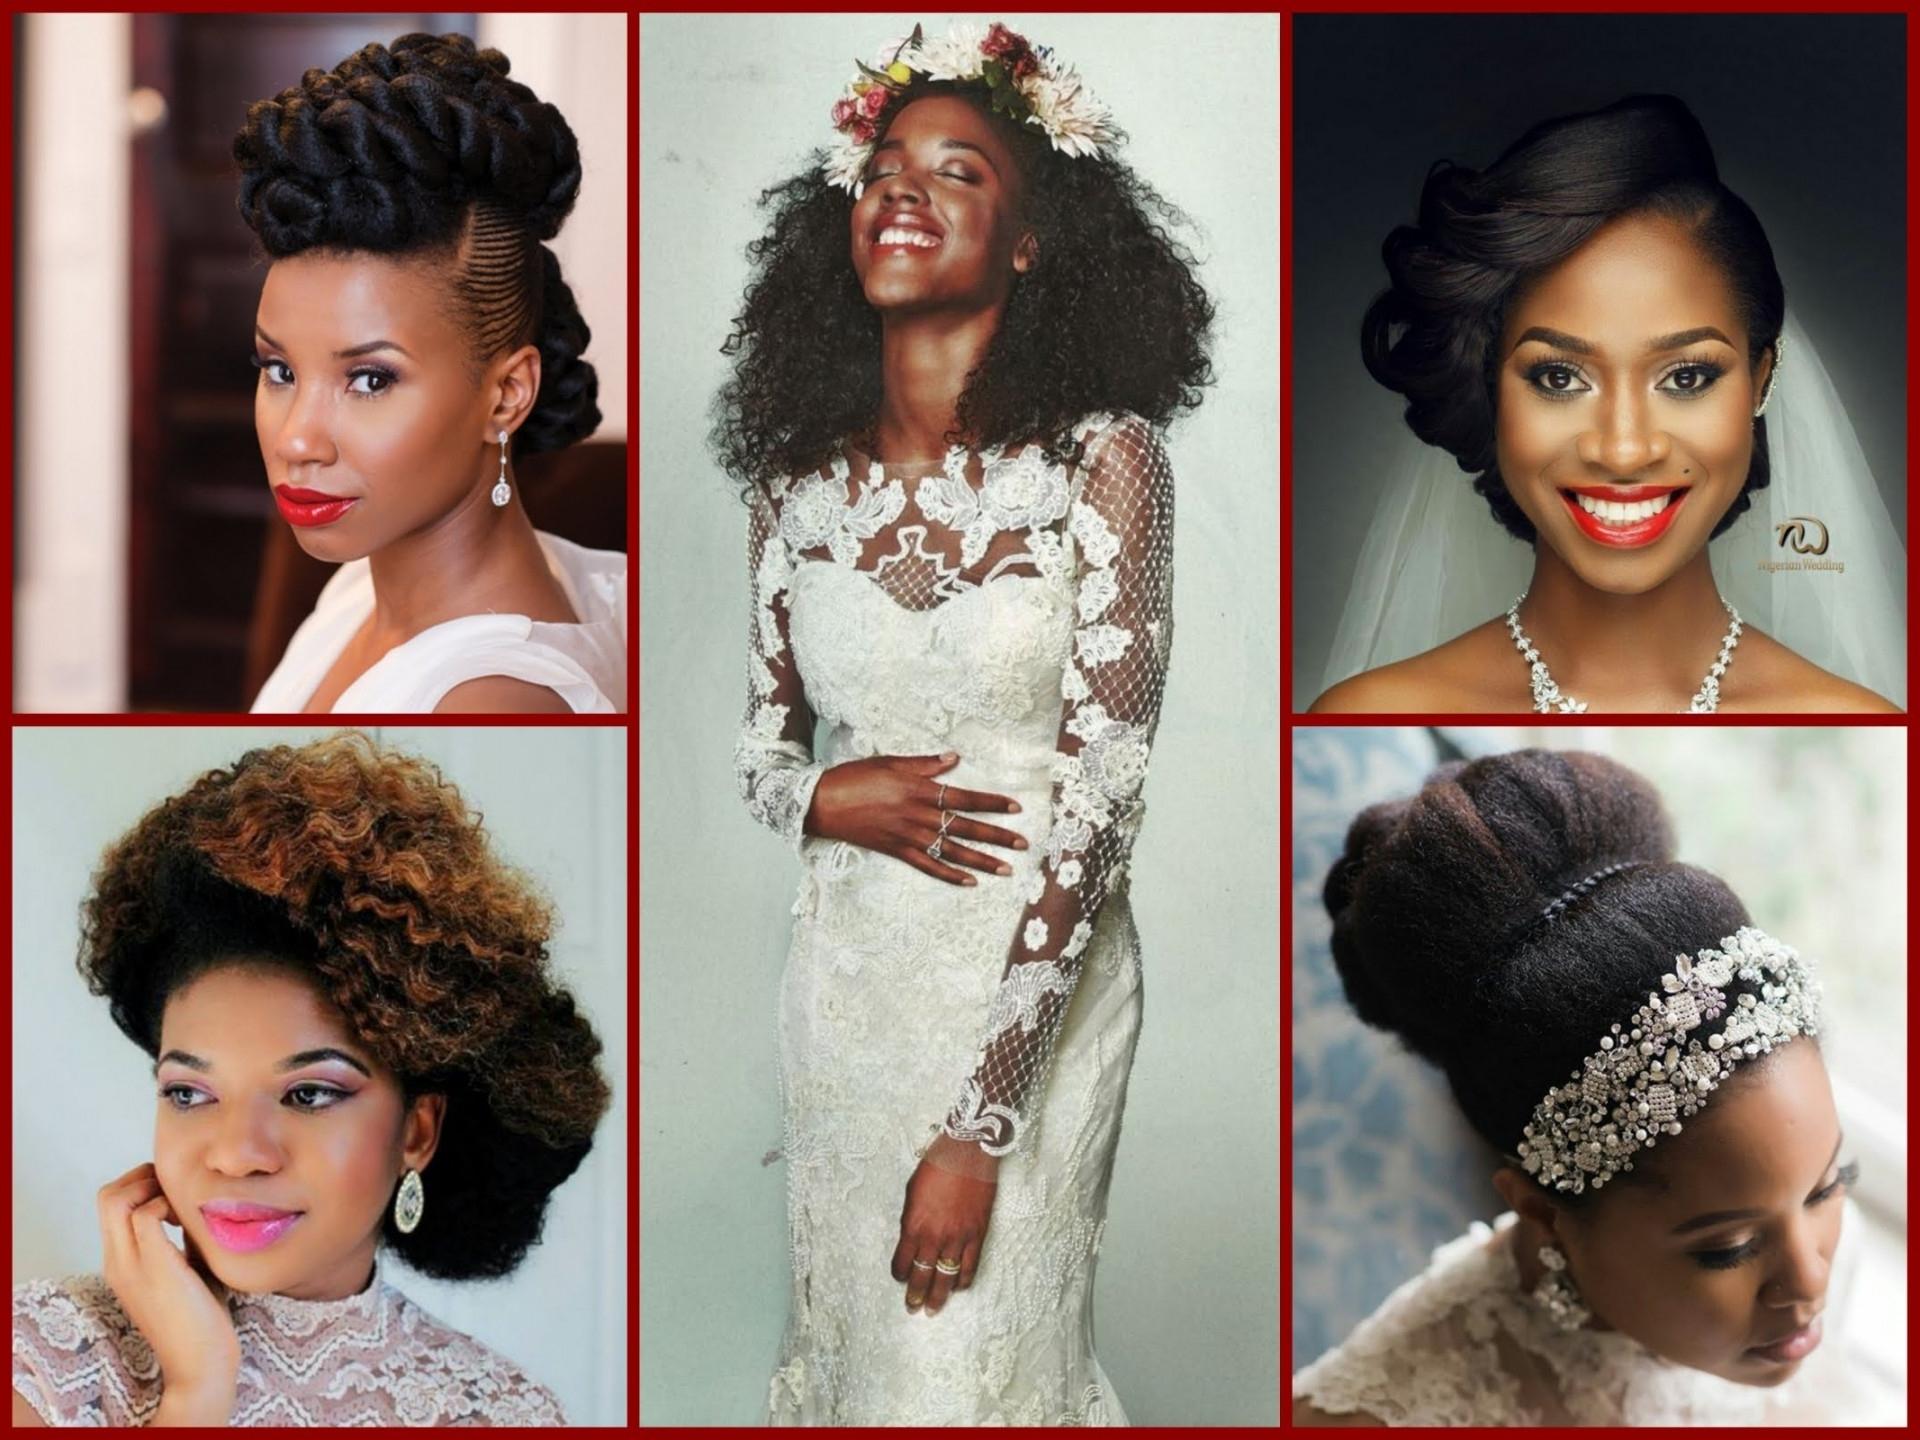 Bridesmaid Hairstyles For Short Black Hair In Updo Hairstyles For Black Bridesmaids (View 6 of 15)